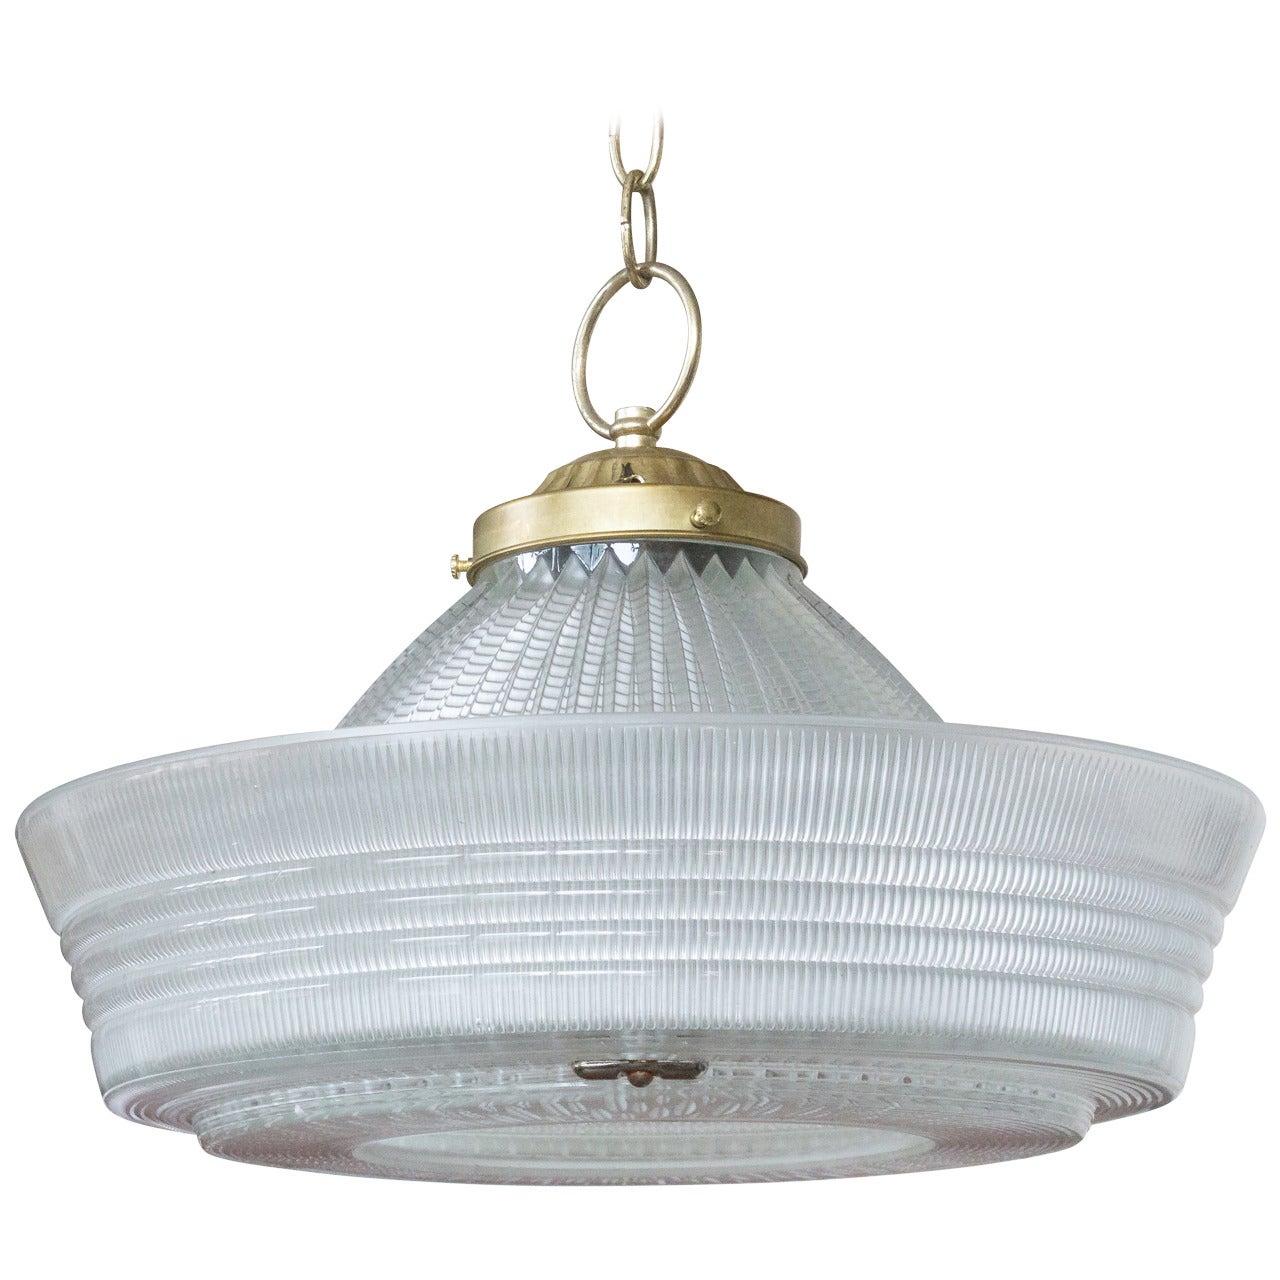 Vintage Hanging Glass Light, 20th Century